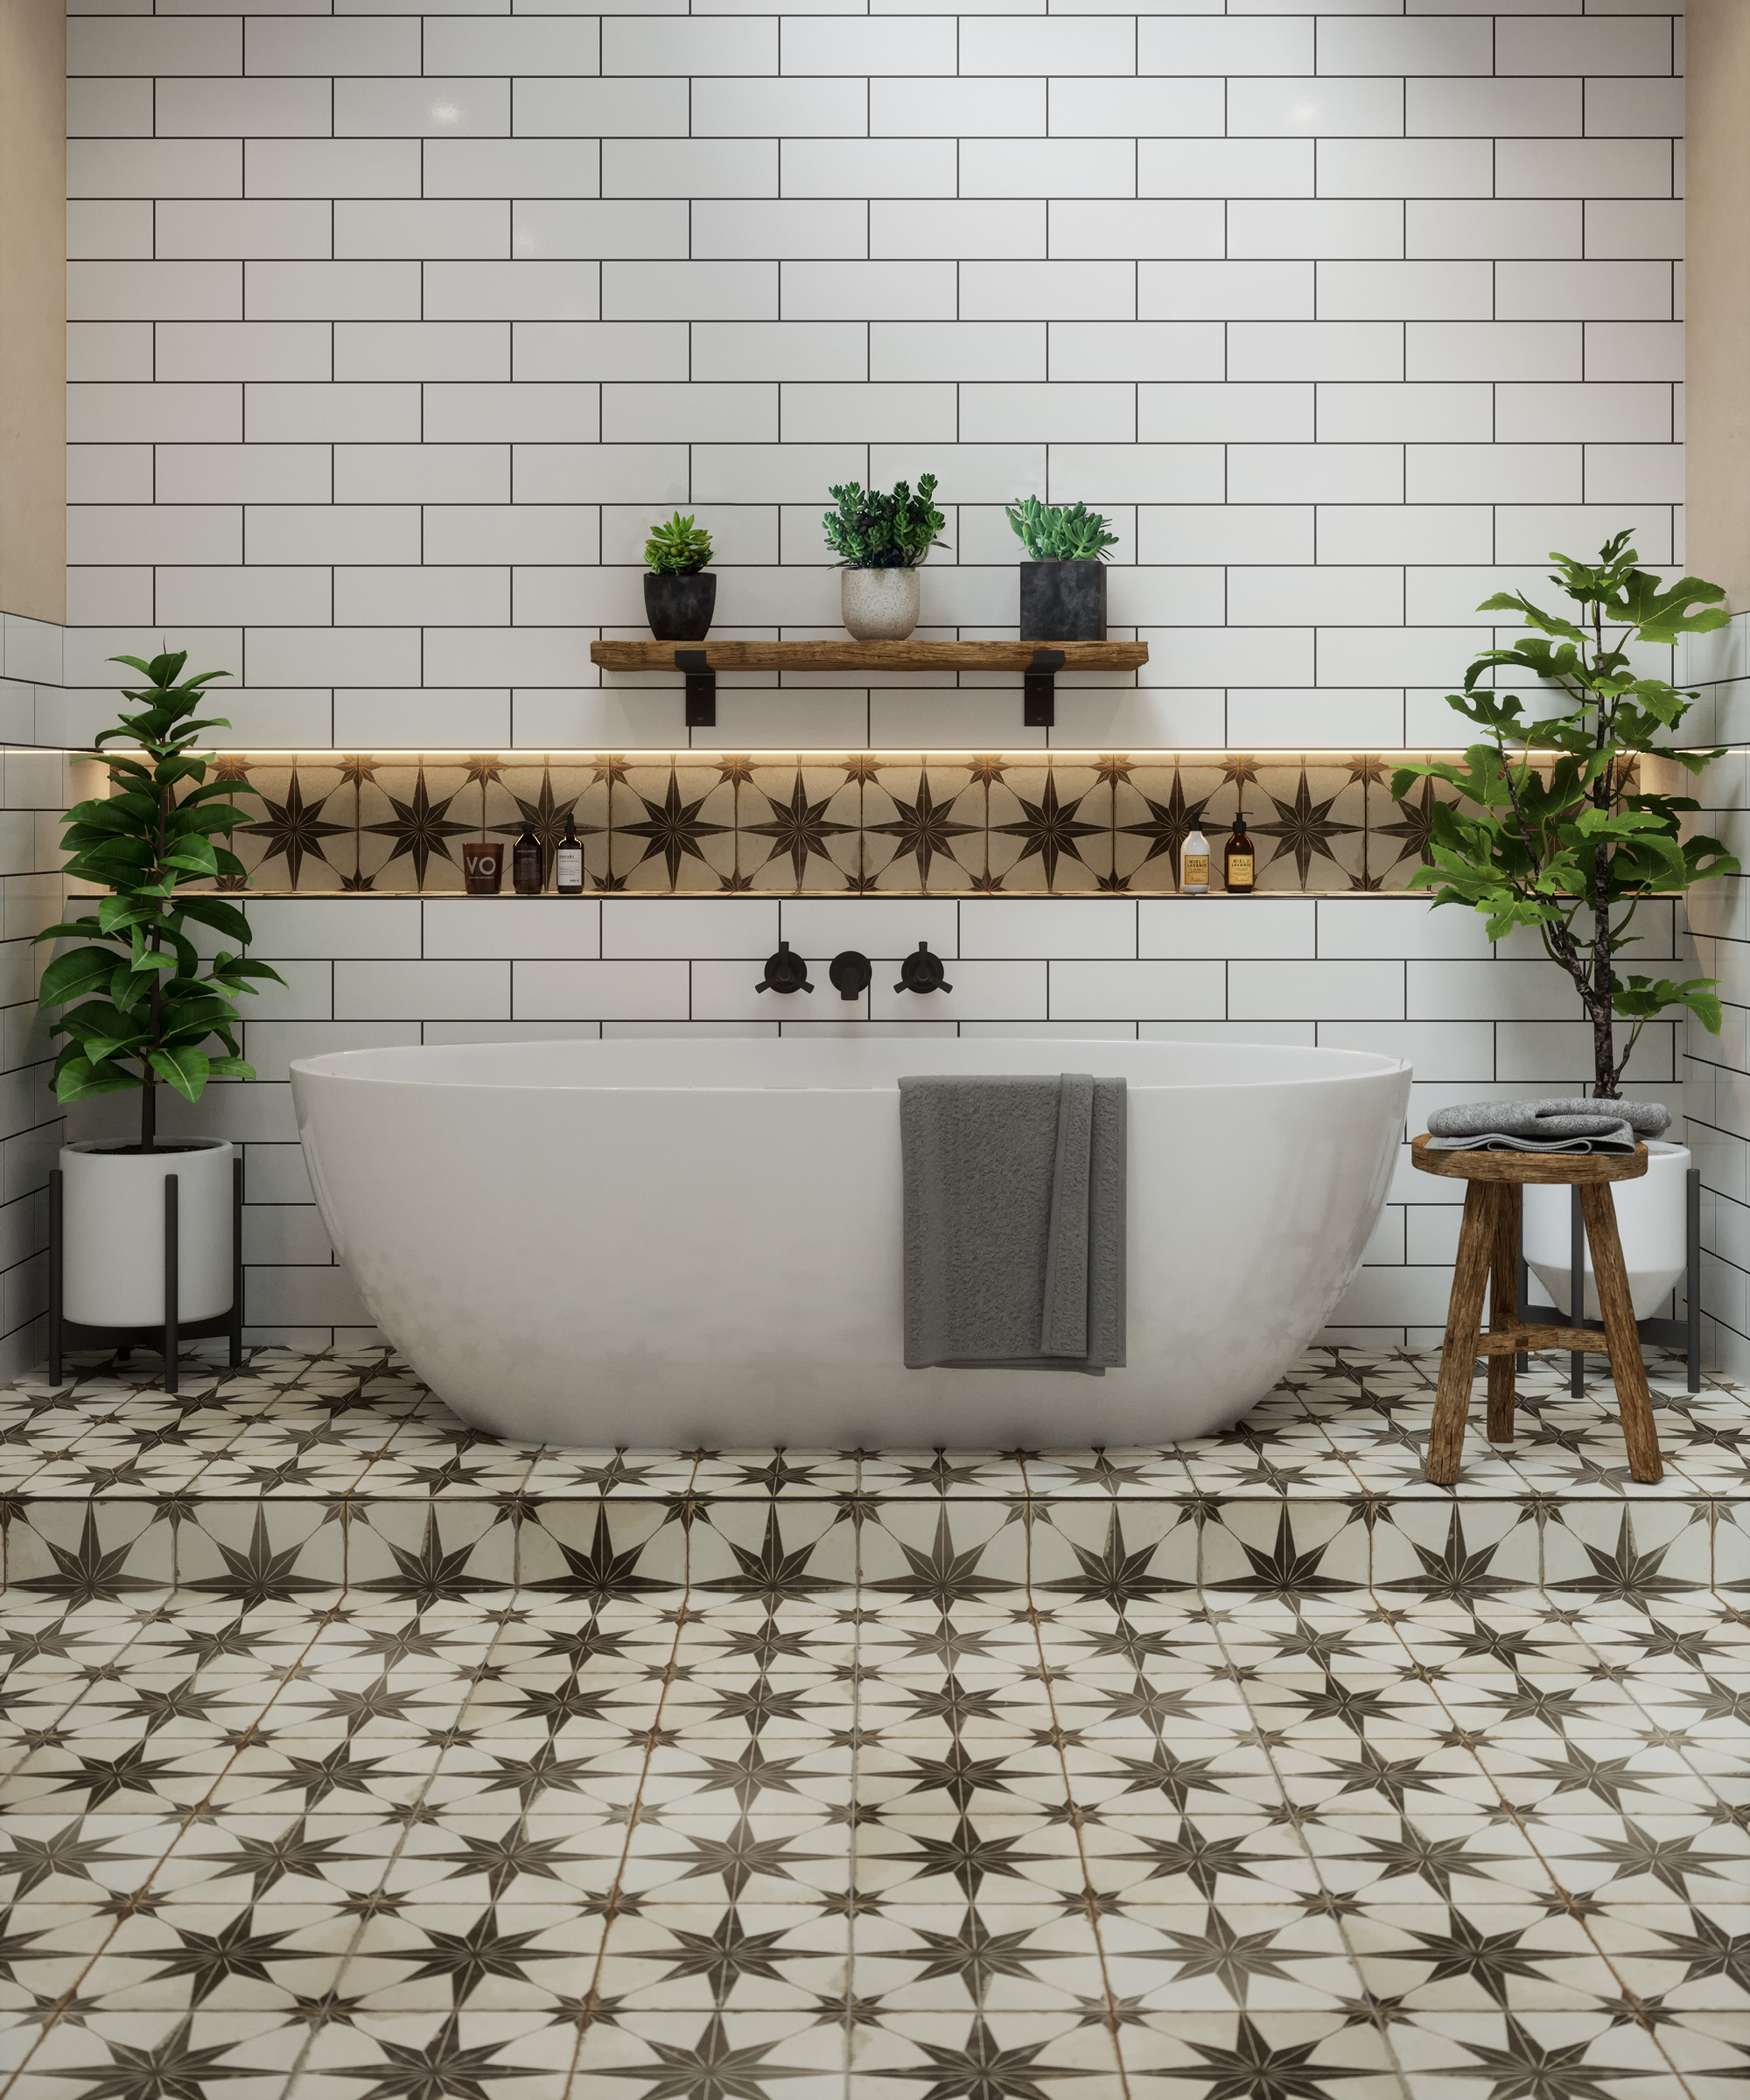 Bathroom Tile Ideas 32 New Looks To, Tile Designs For Bathroom